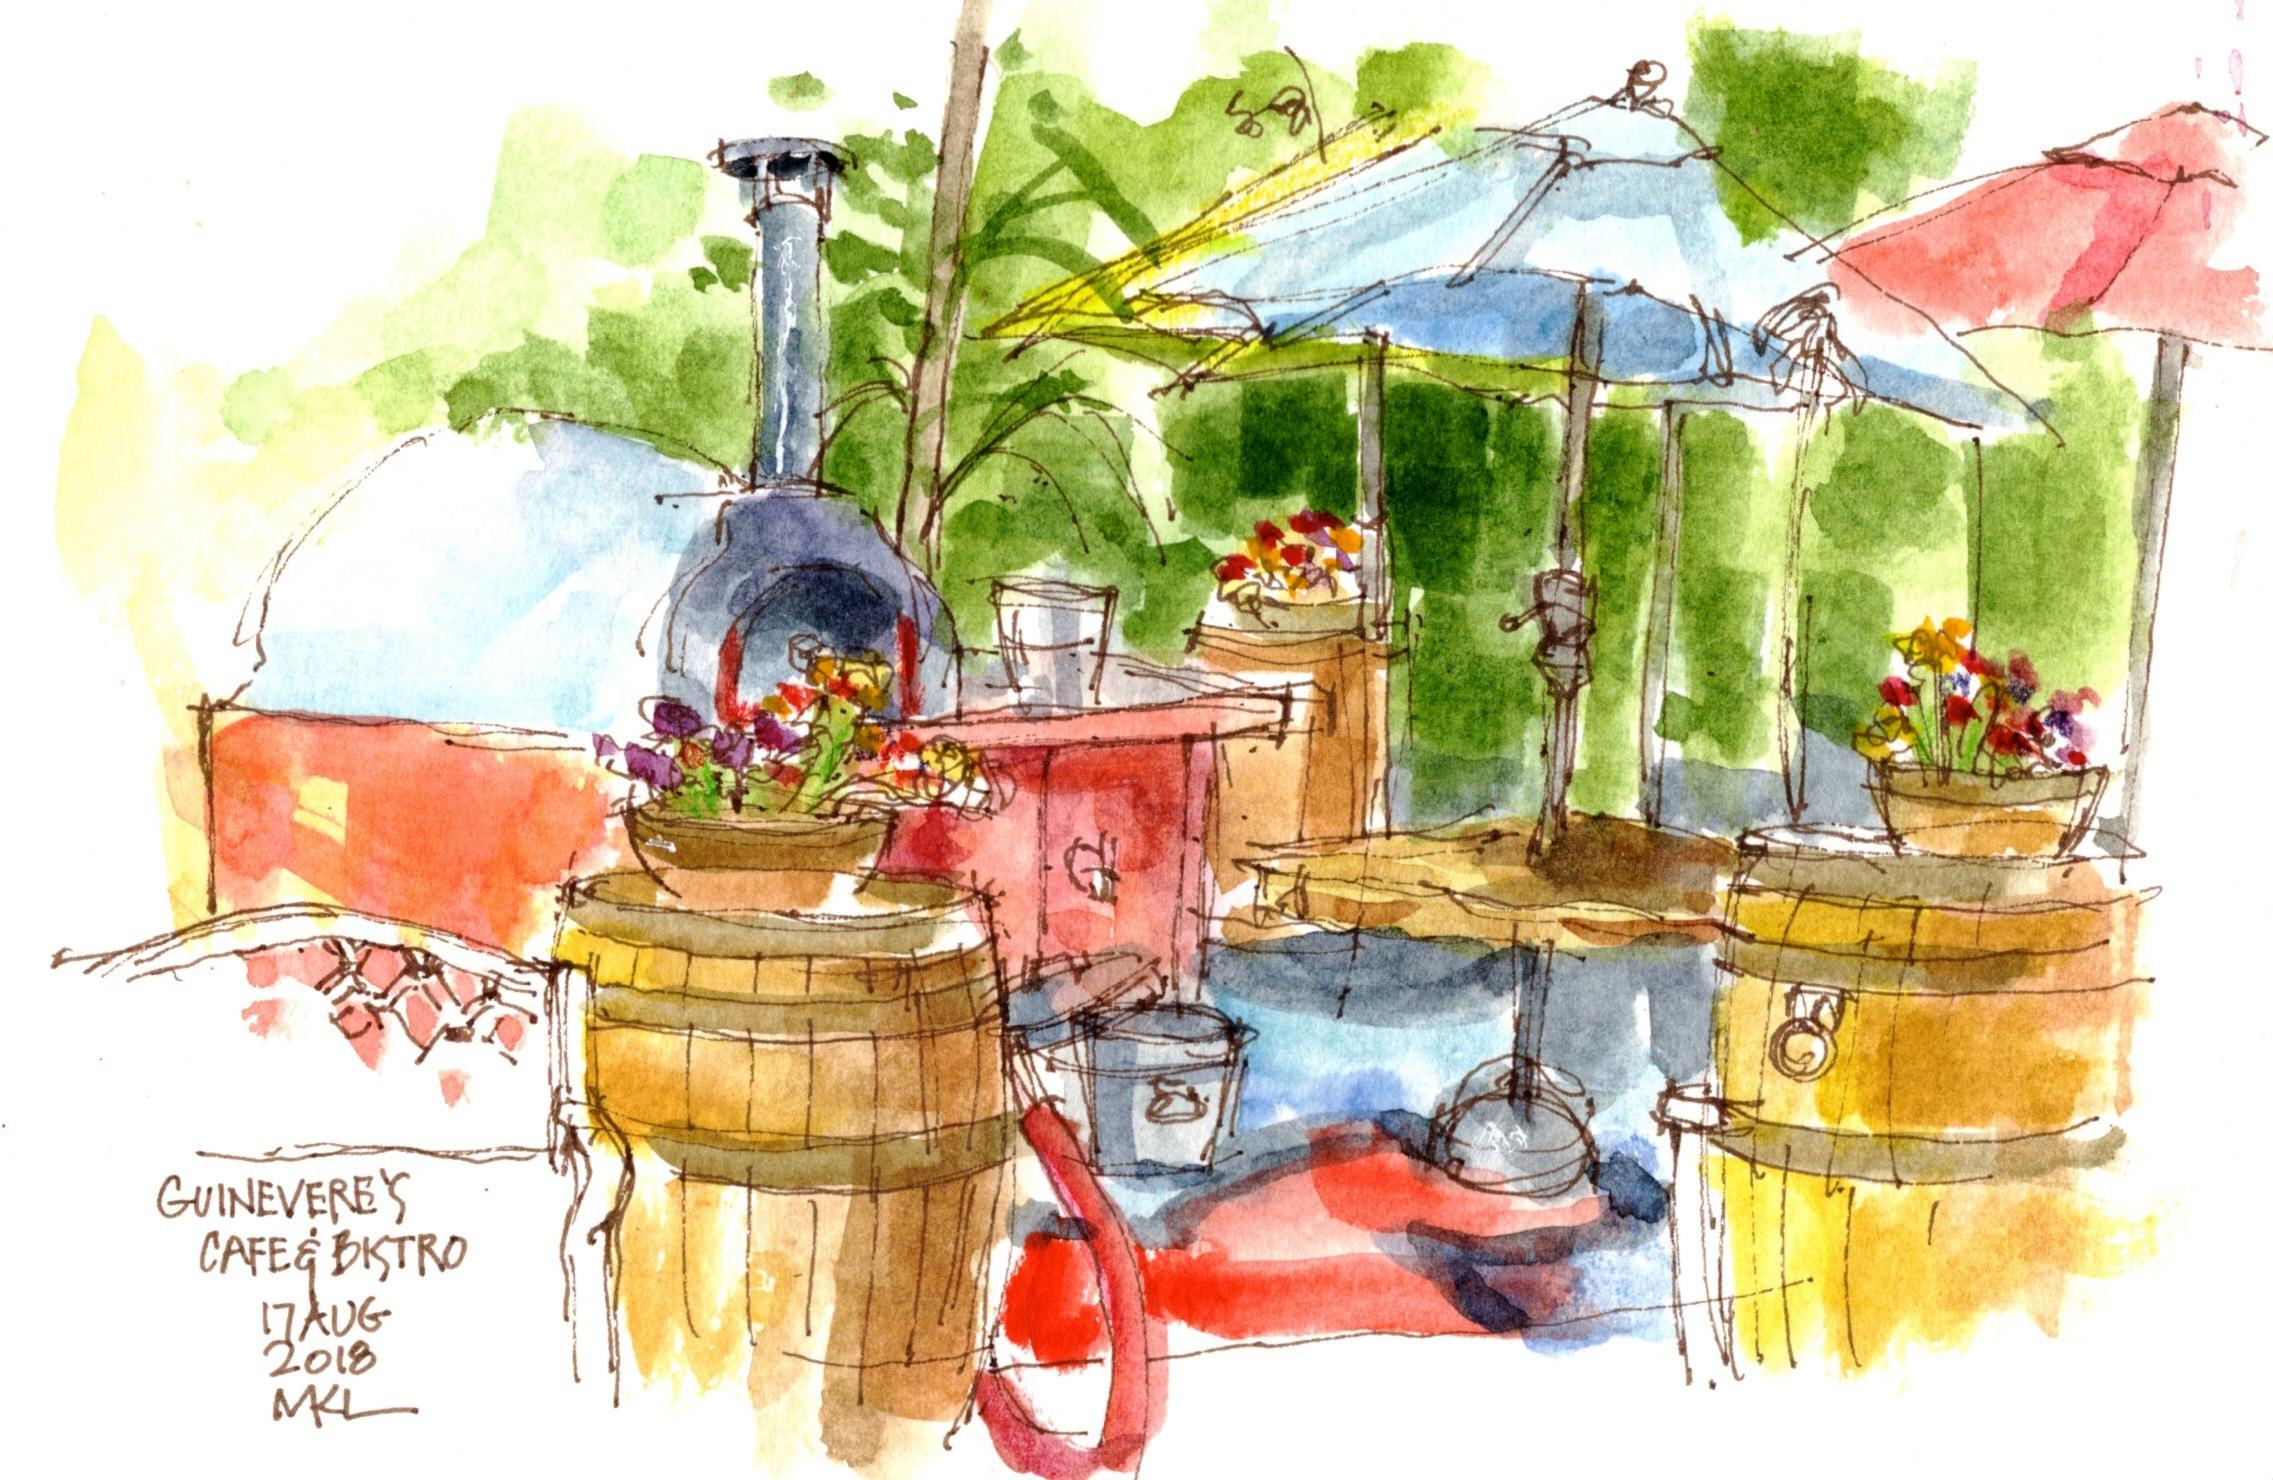 081718 Guinevere Cafe & Bistro